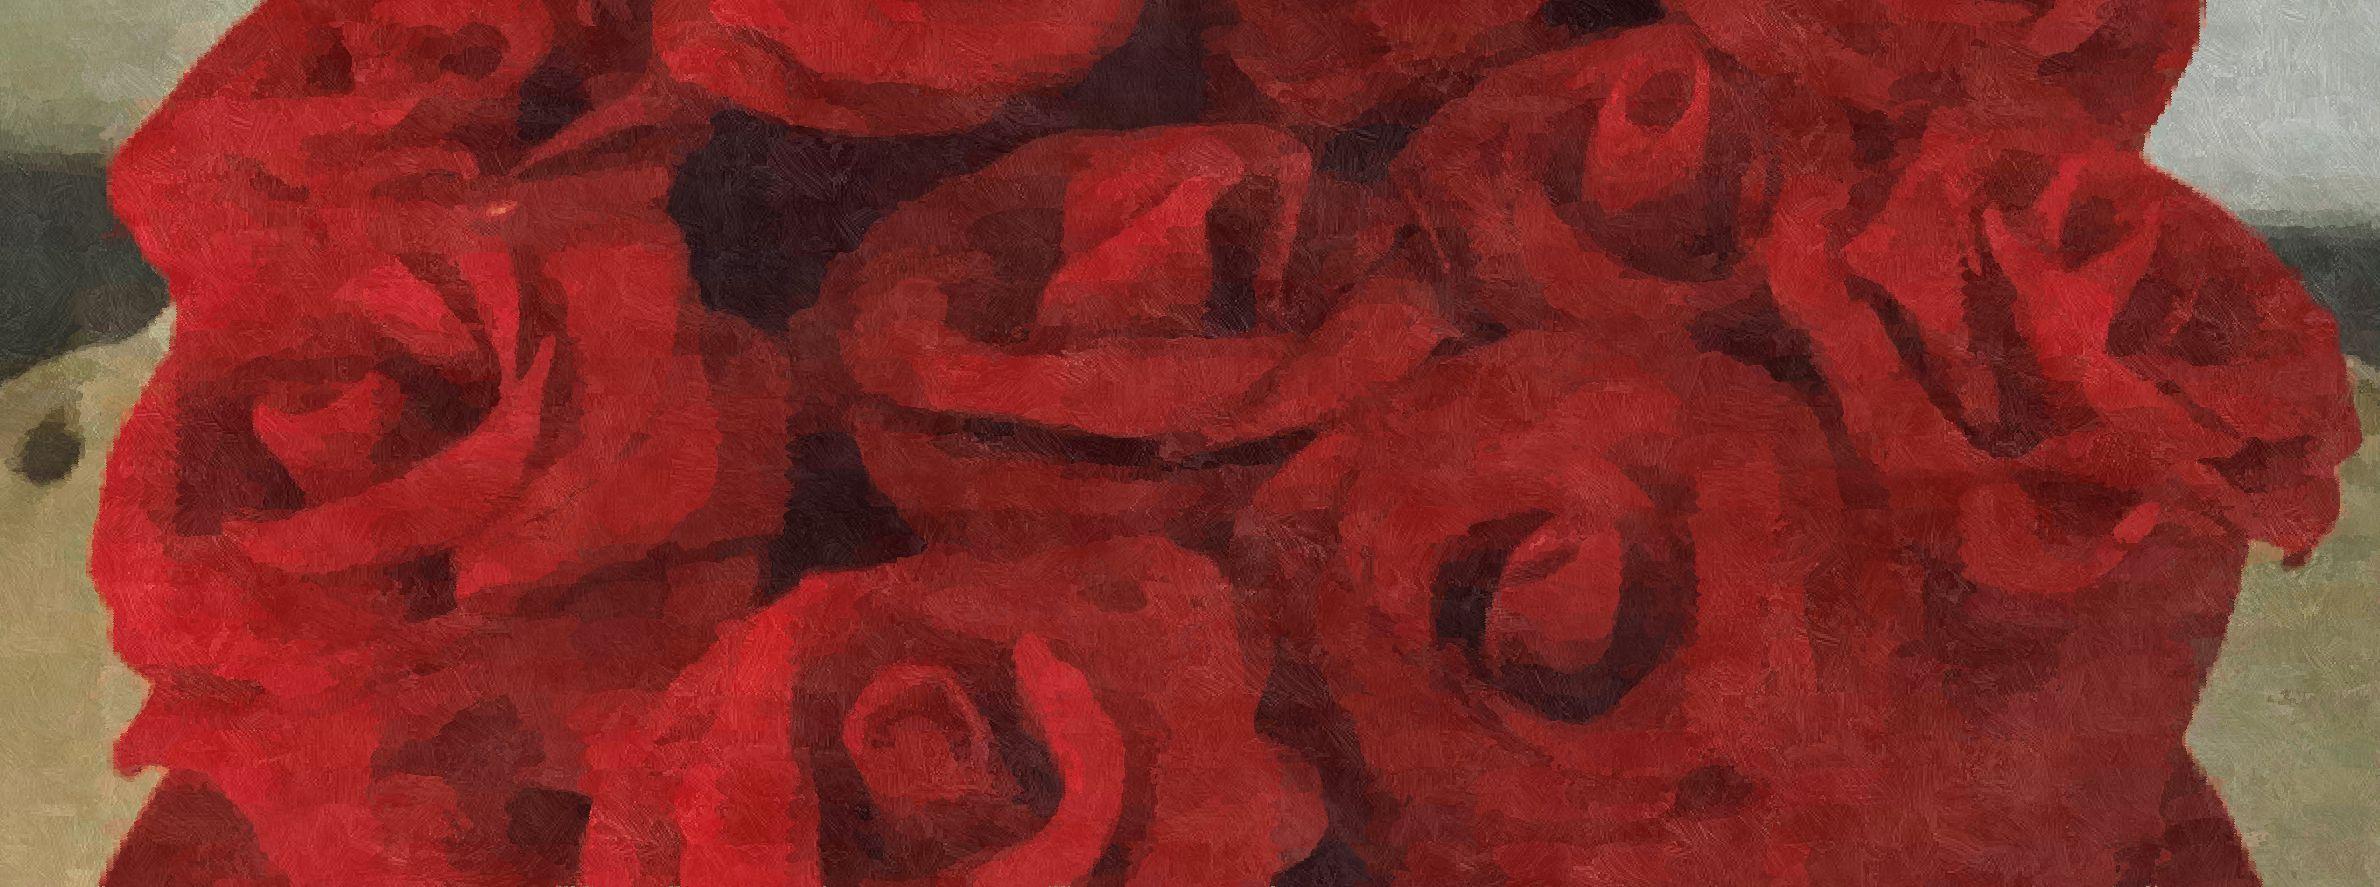 Romántico corazón de rosas